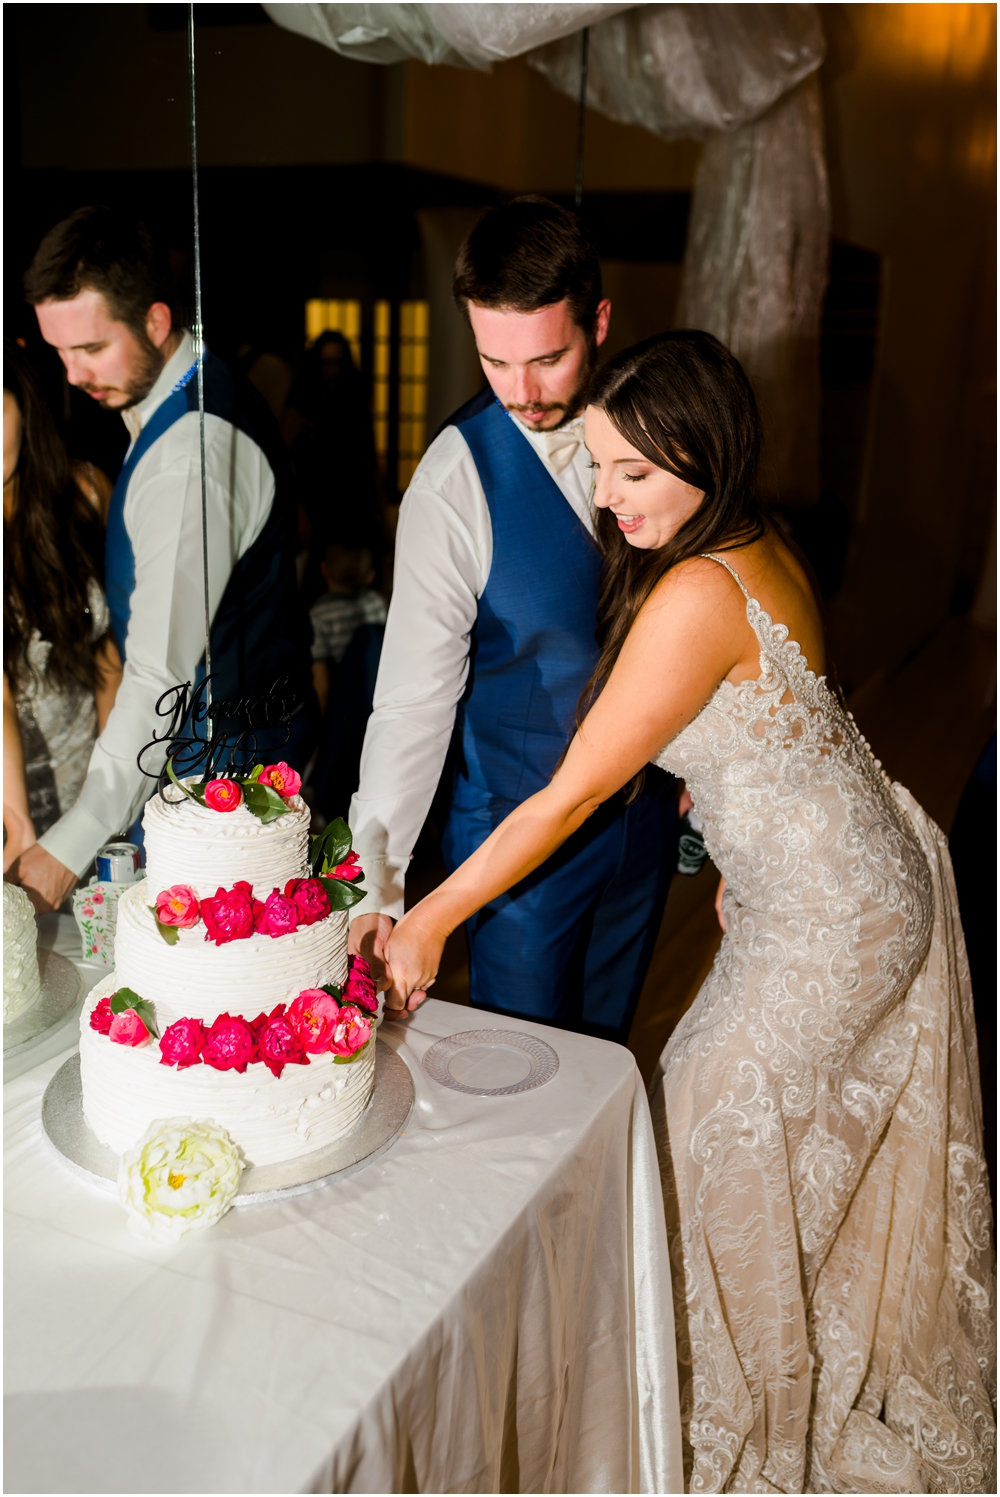 martin-wedding-panama-city-beach-florida-kiersten-stevenson-photography-102.jpg